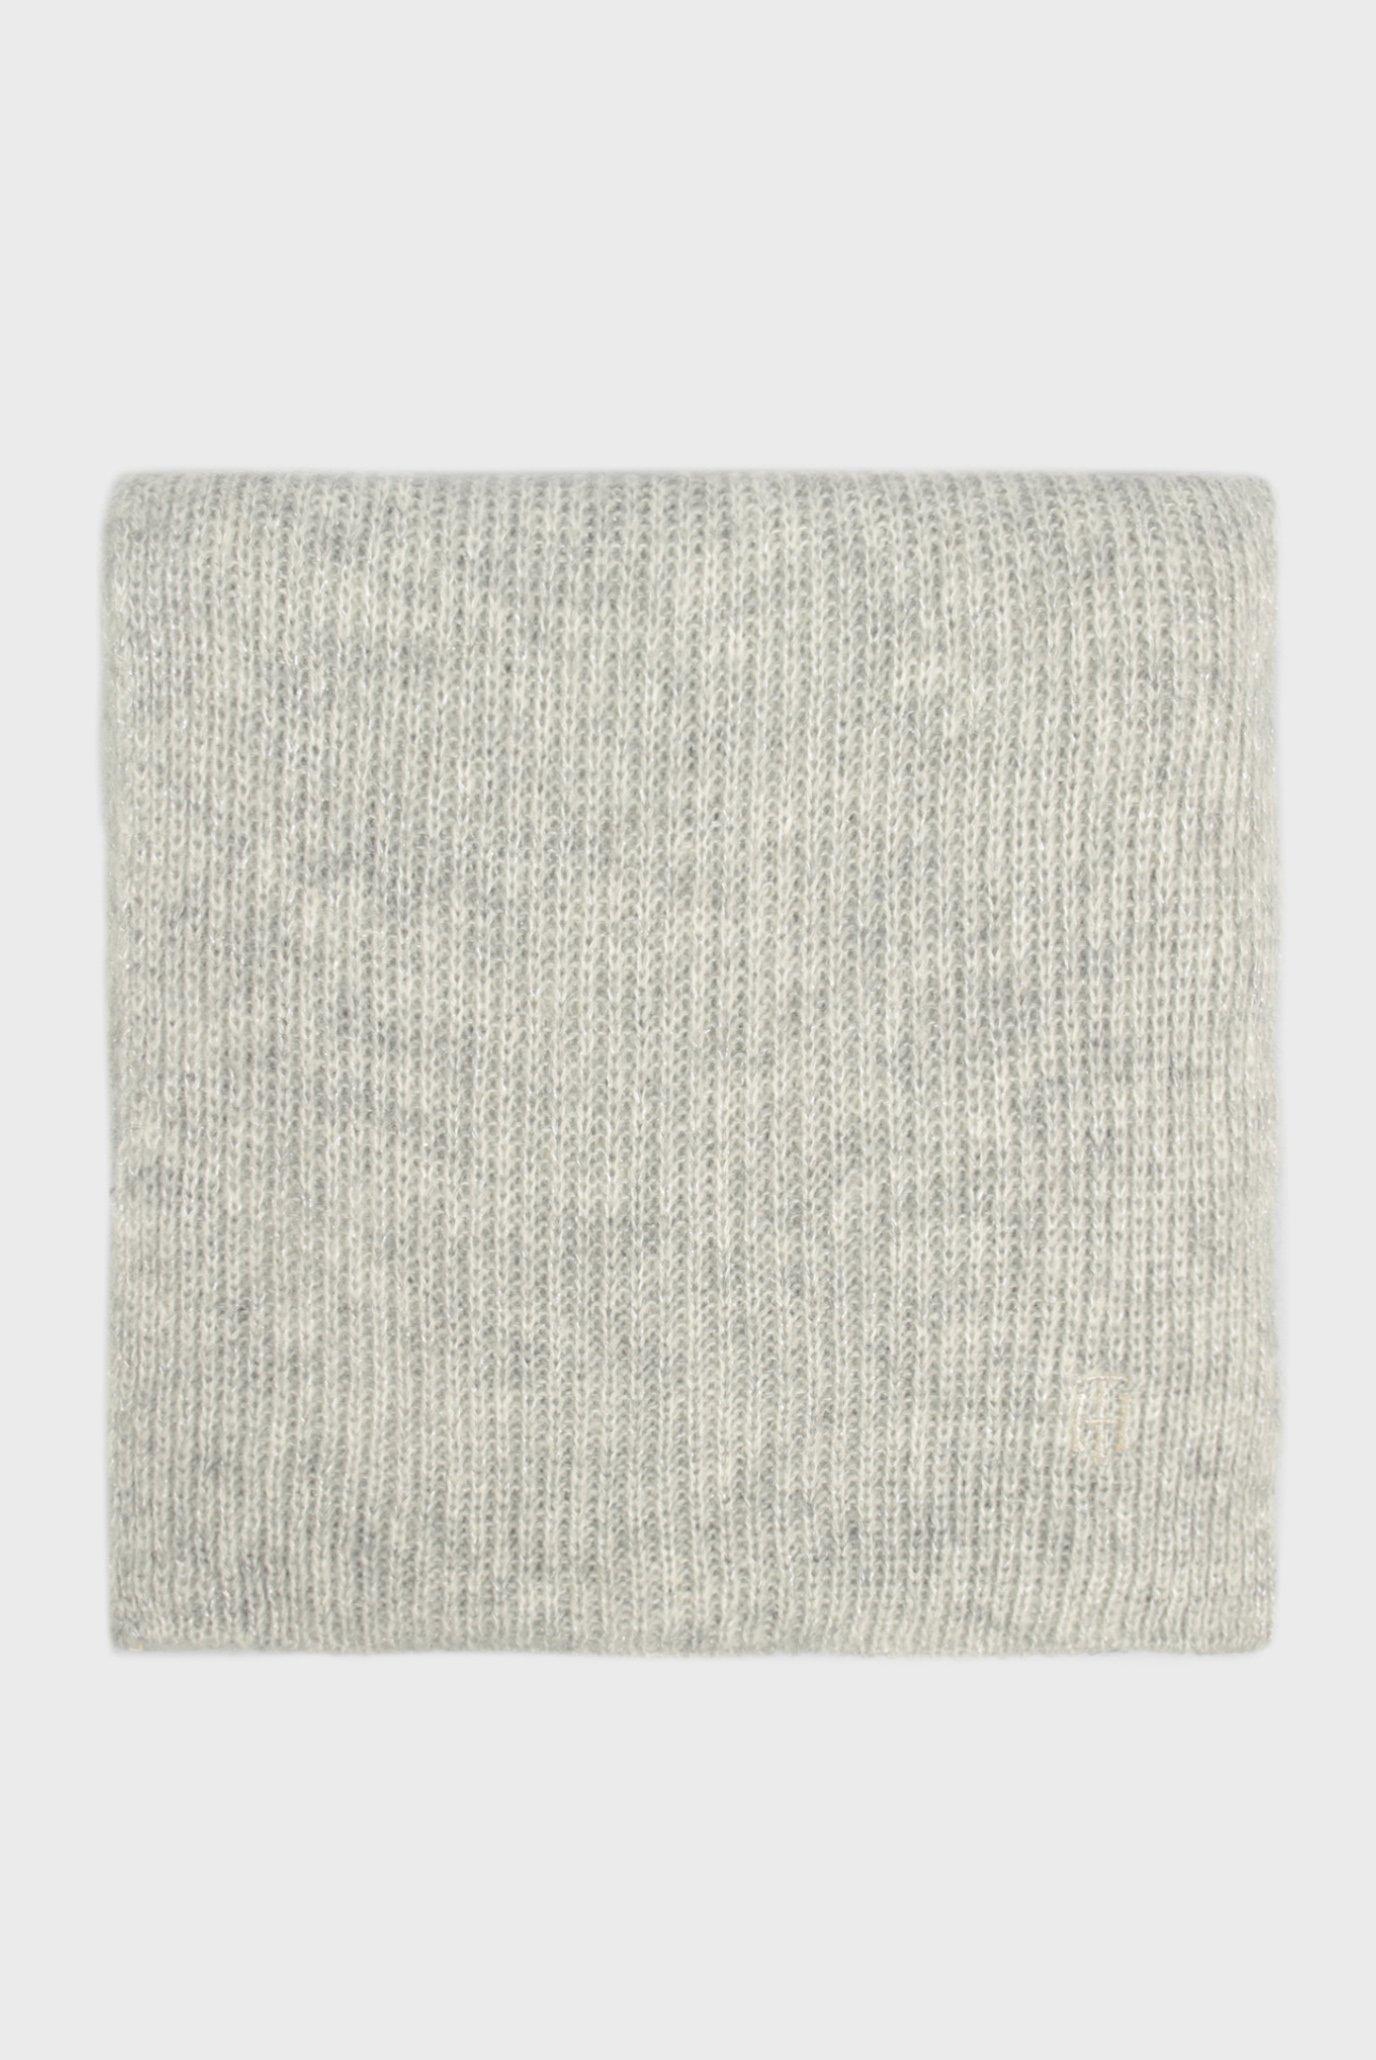 Жіночий сірий шарф TH EFFORTLESS 1